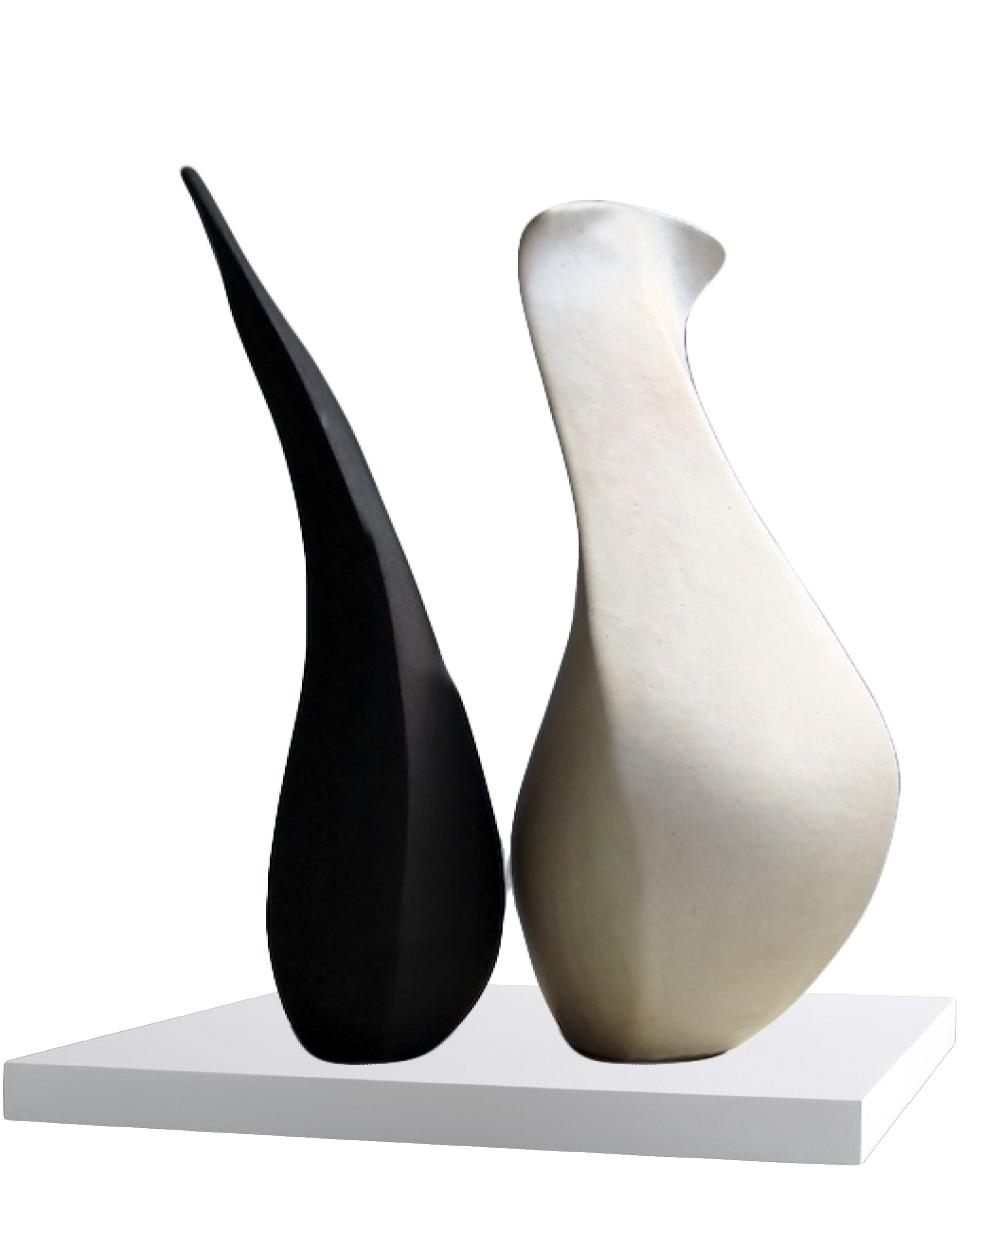 Artlease Vanguard Additional revision Sculpture Jane Mason (1)-8.jpg